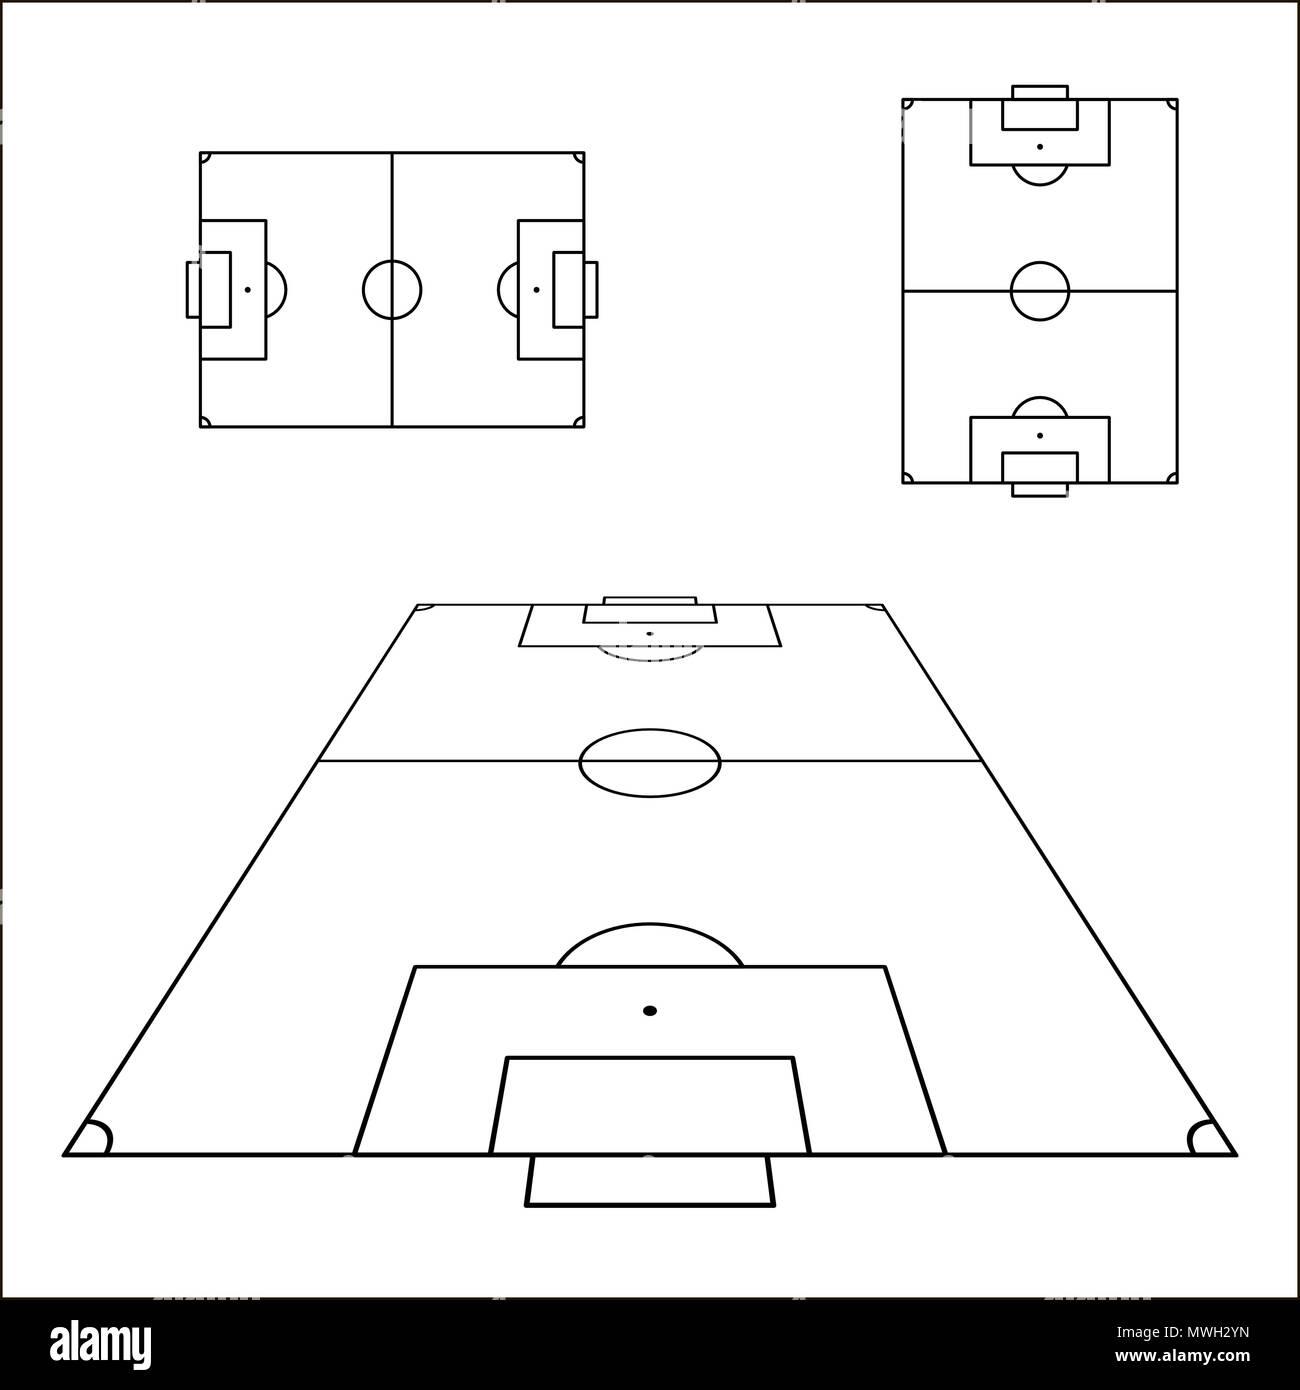 Football Pitch Illustration Stockfotos & Football Pitch Illustration ...